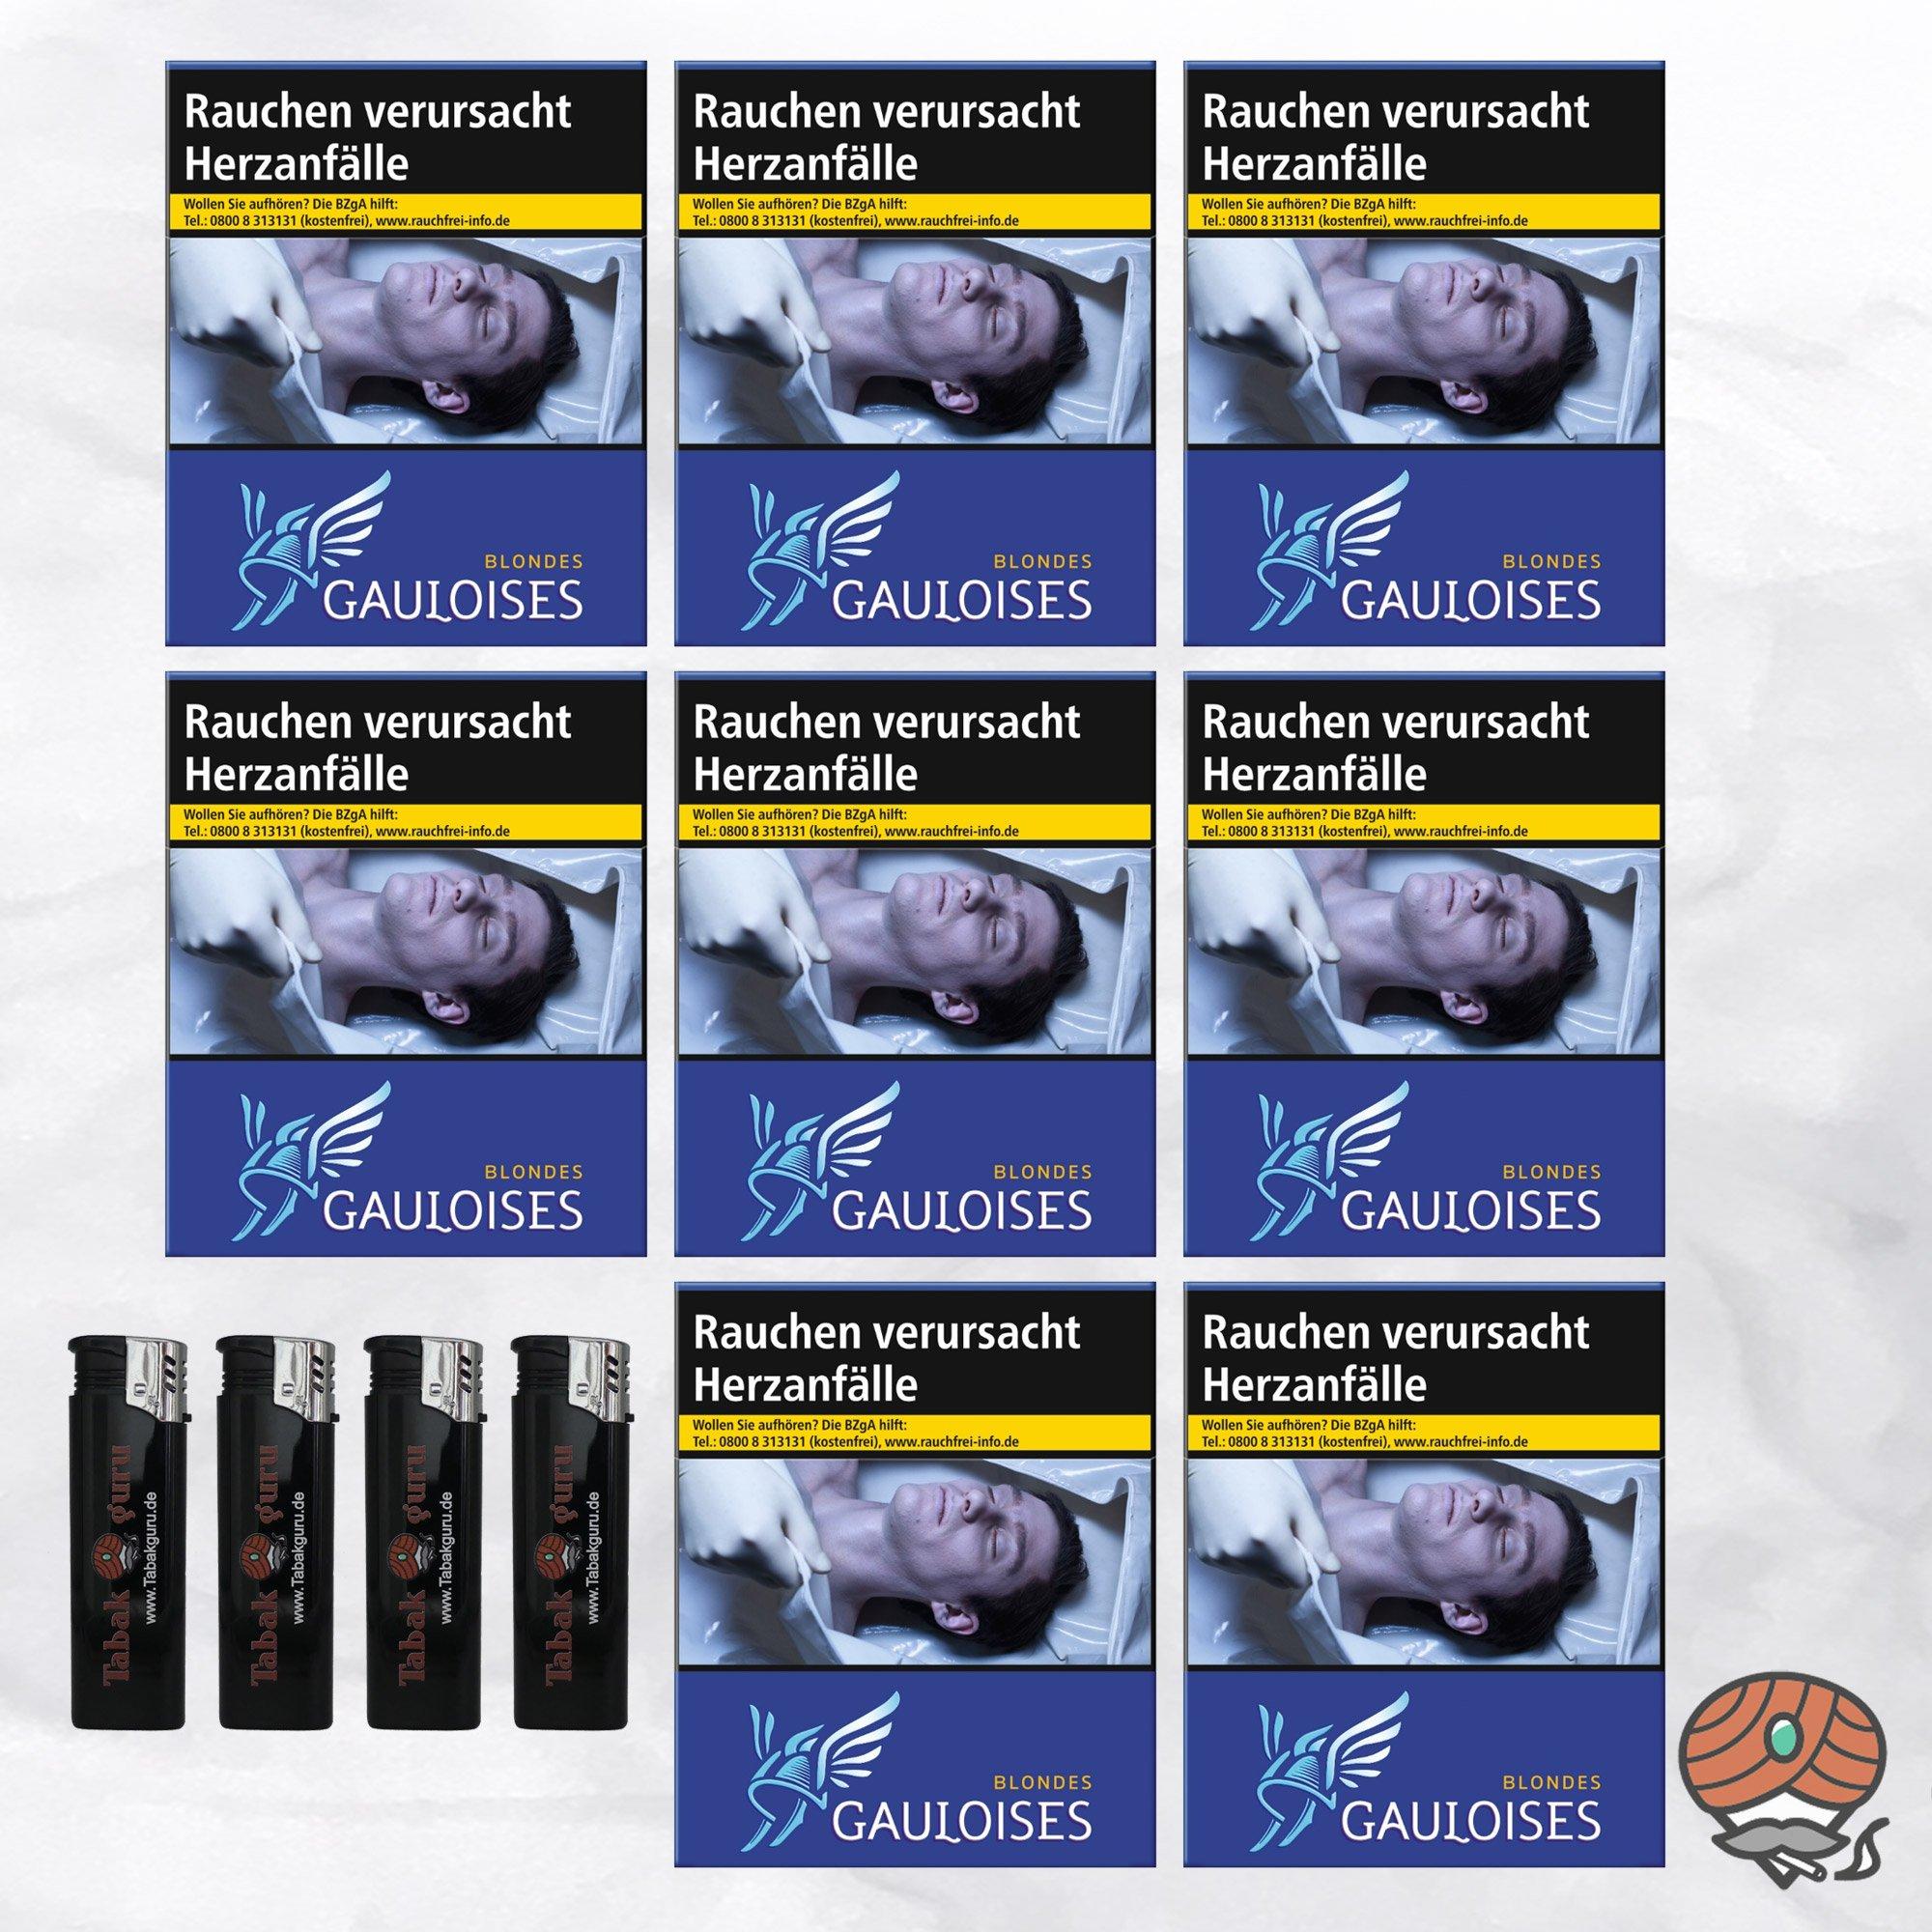 8 x Gauloises Blondes Blau XXXL Zigaretten à 31 Stück + 4 Feuerzeuge